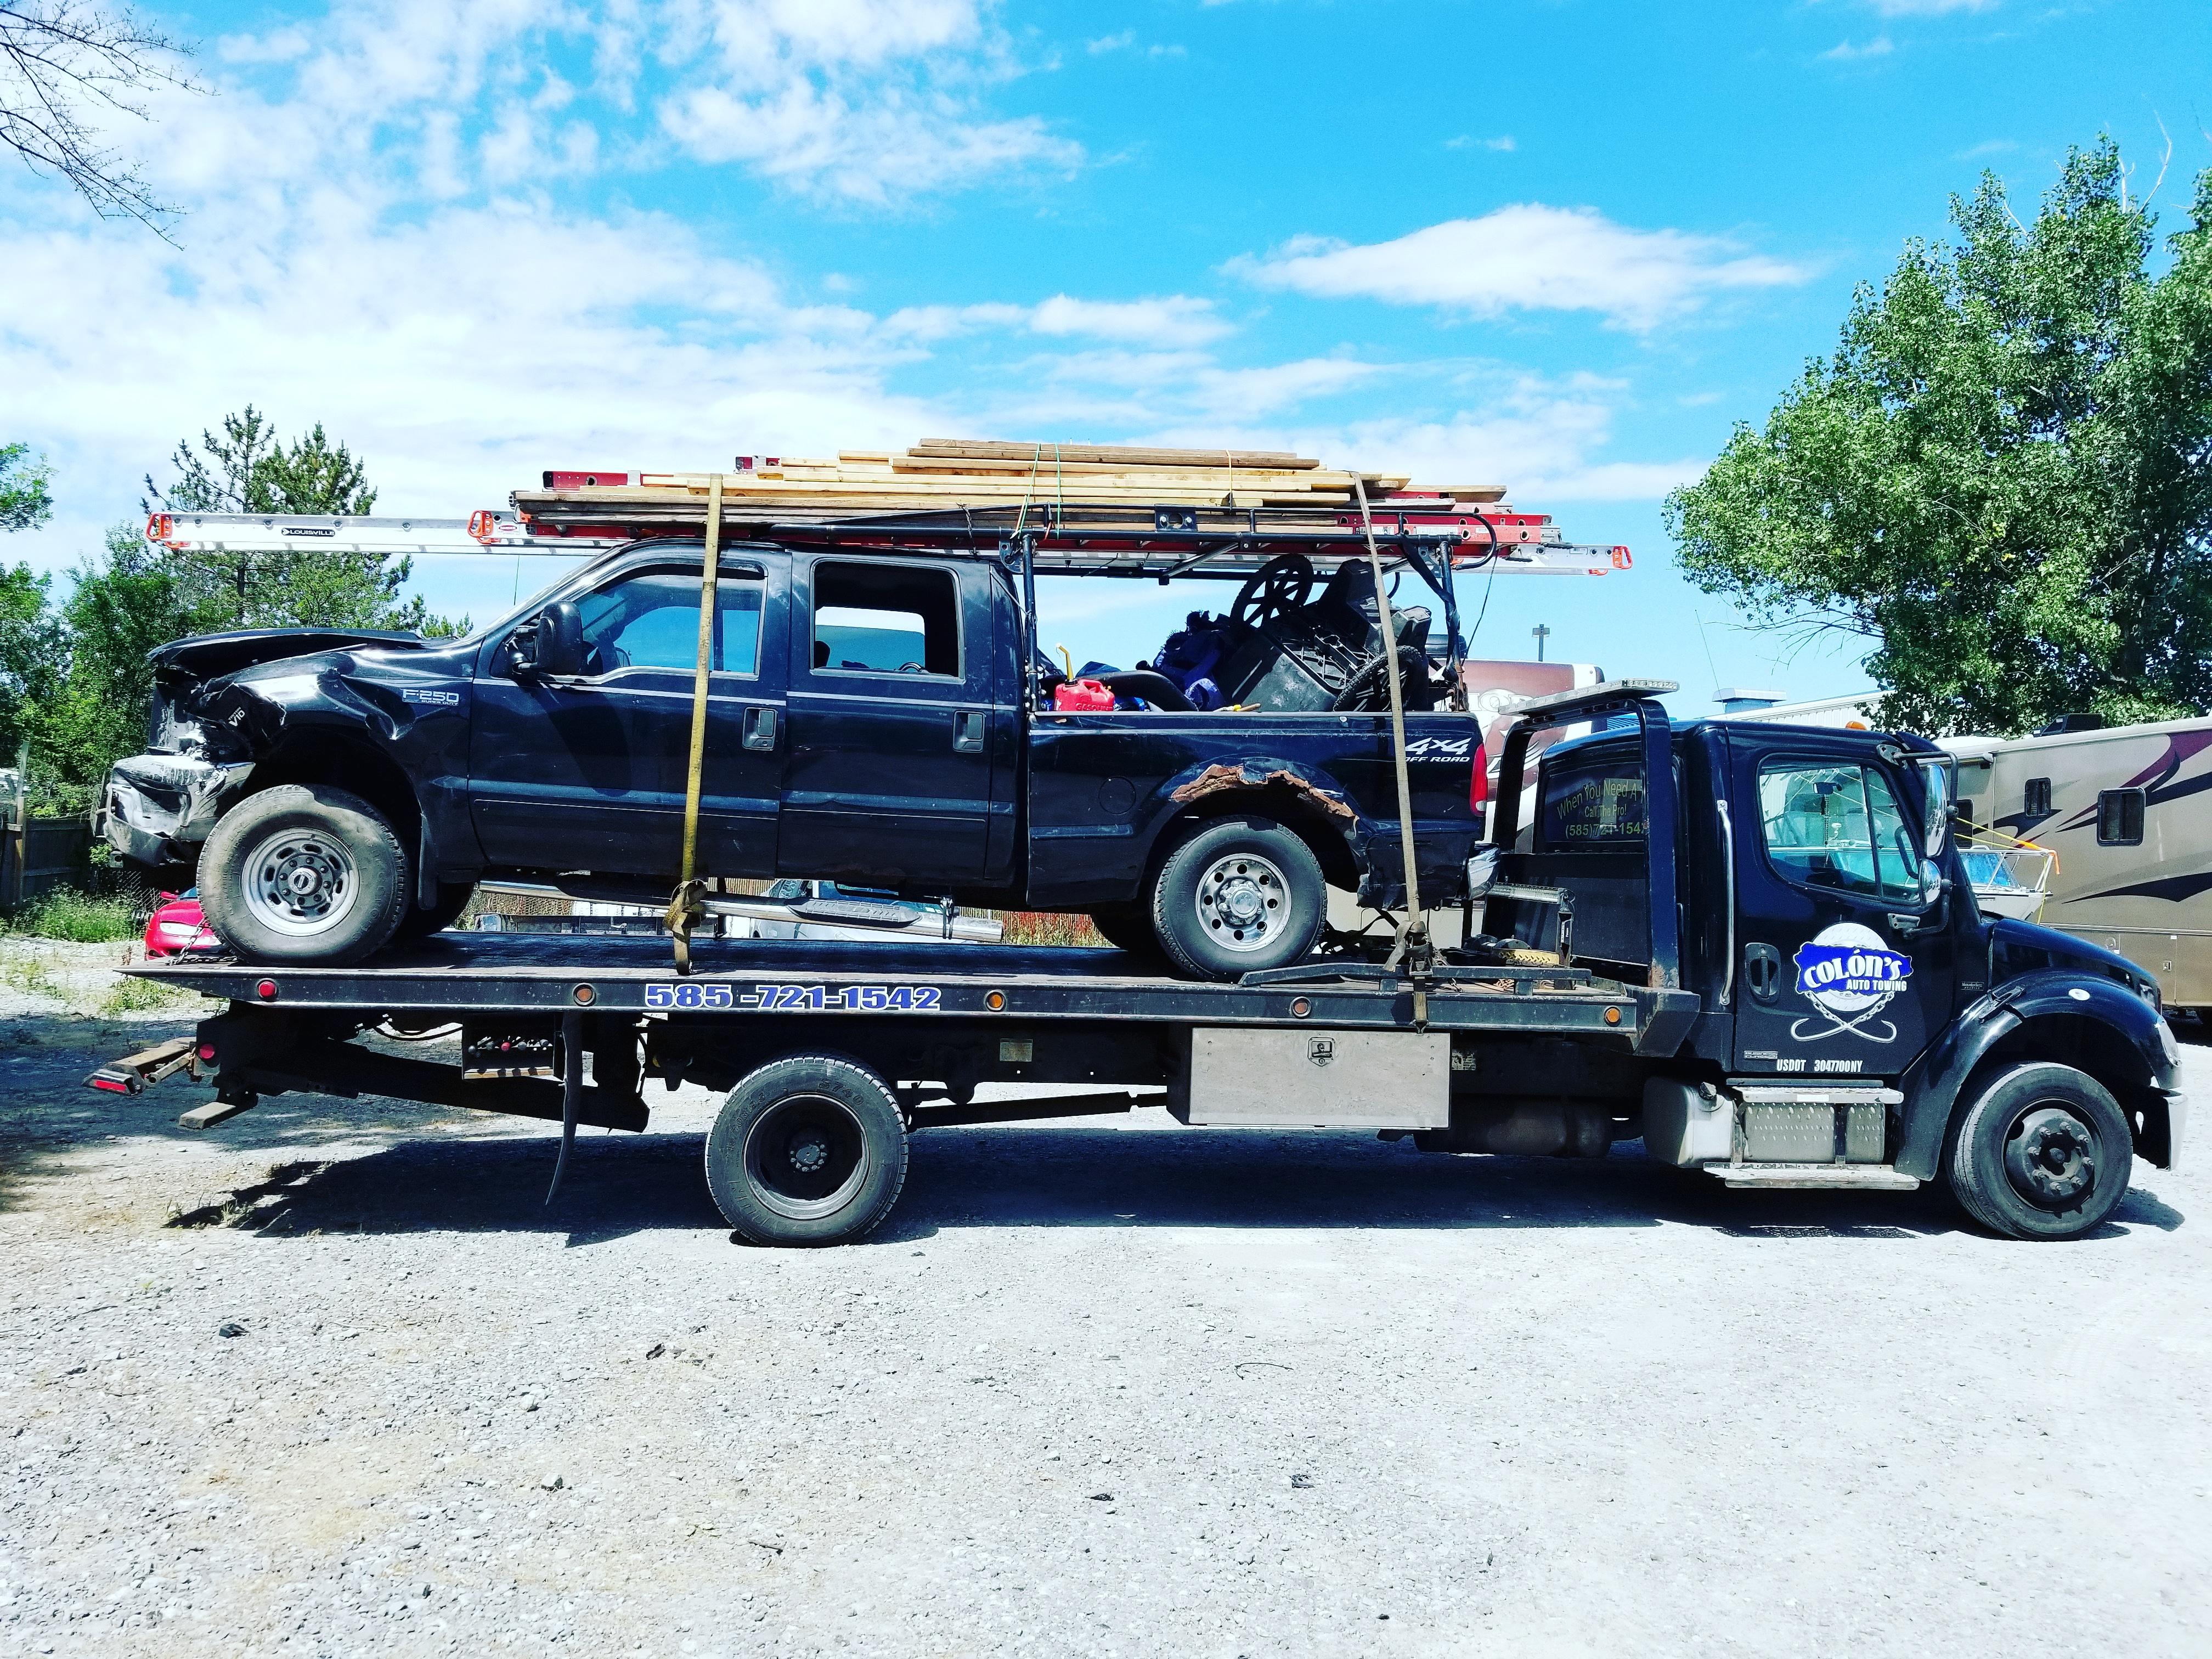 Colon's Auto Towing LLC image 2